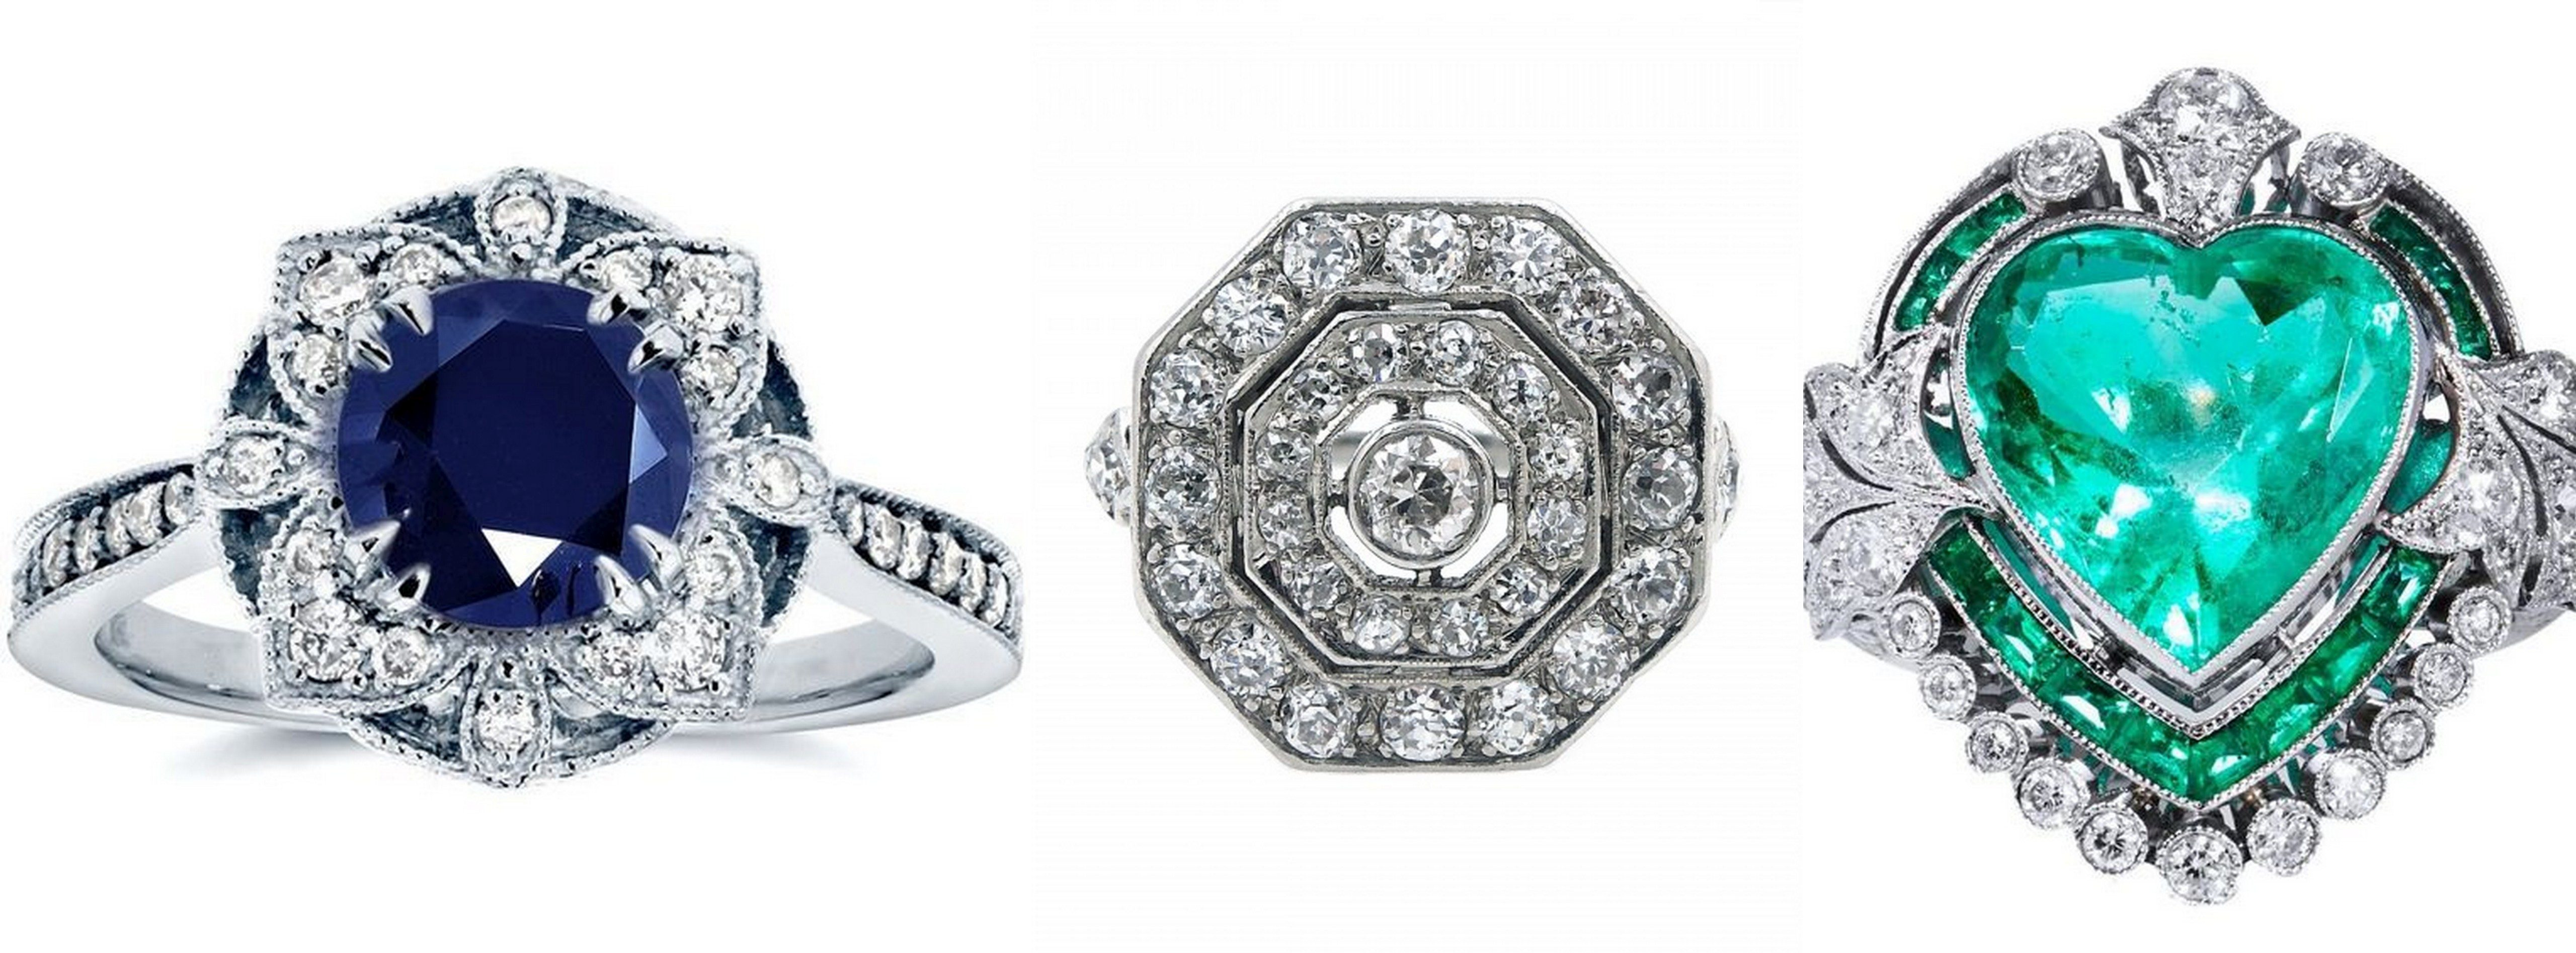 ,vintage gyuruk,vintage gyűrű,